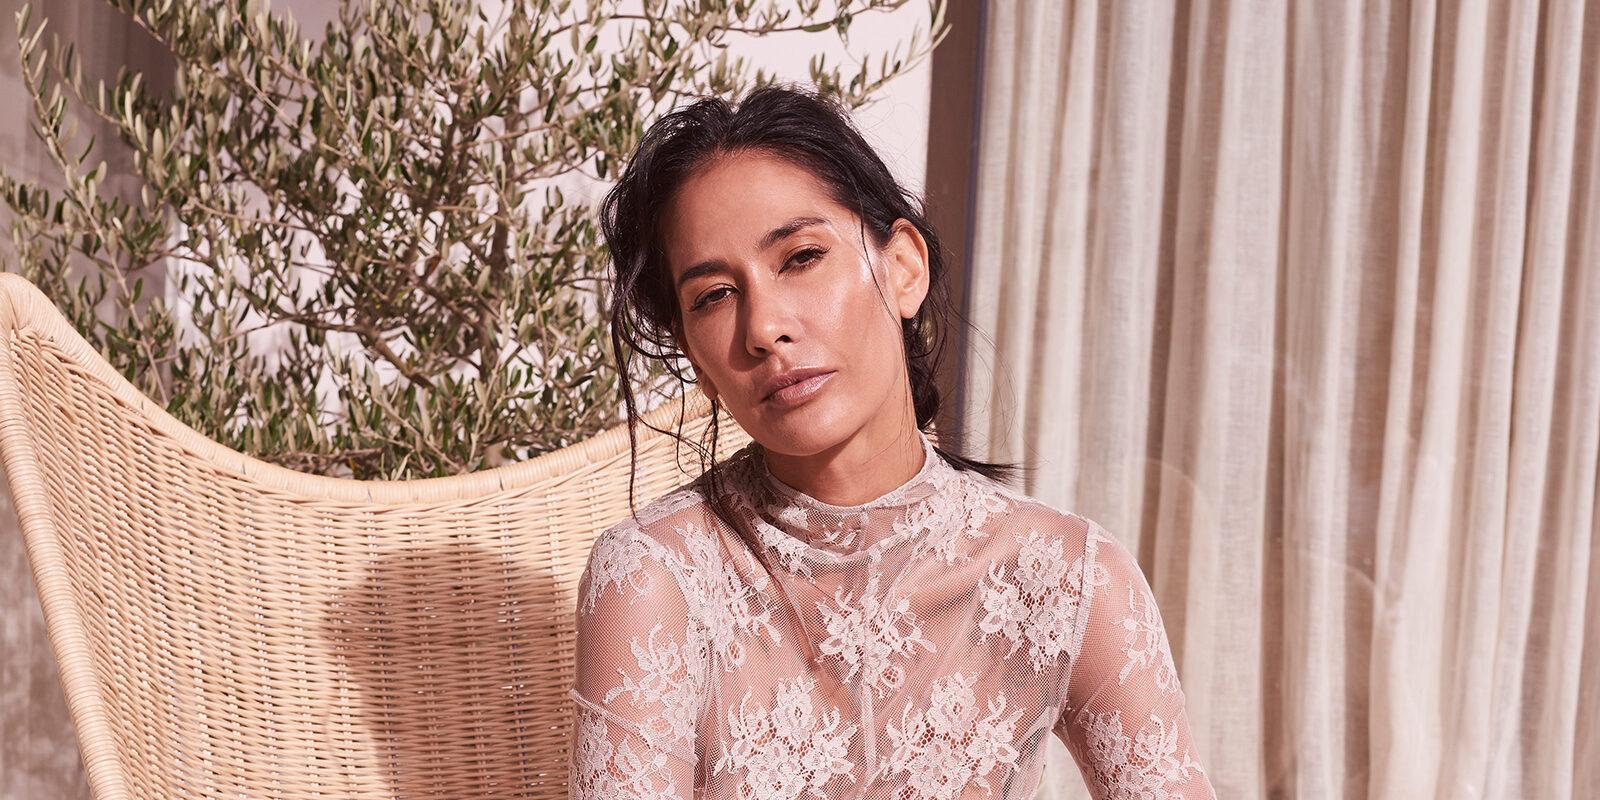 Lindy Klim's new intimate wellness brand, FIG Femme